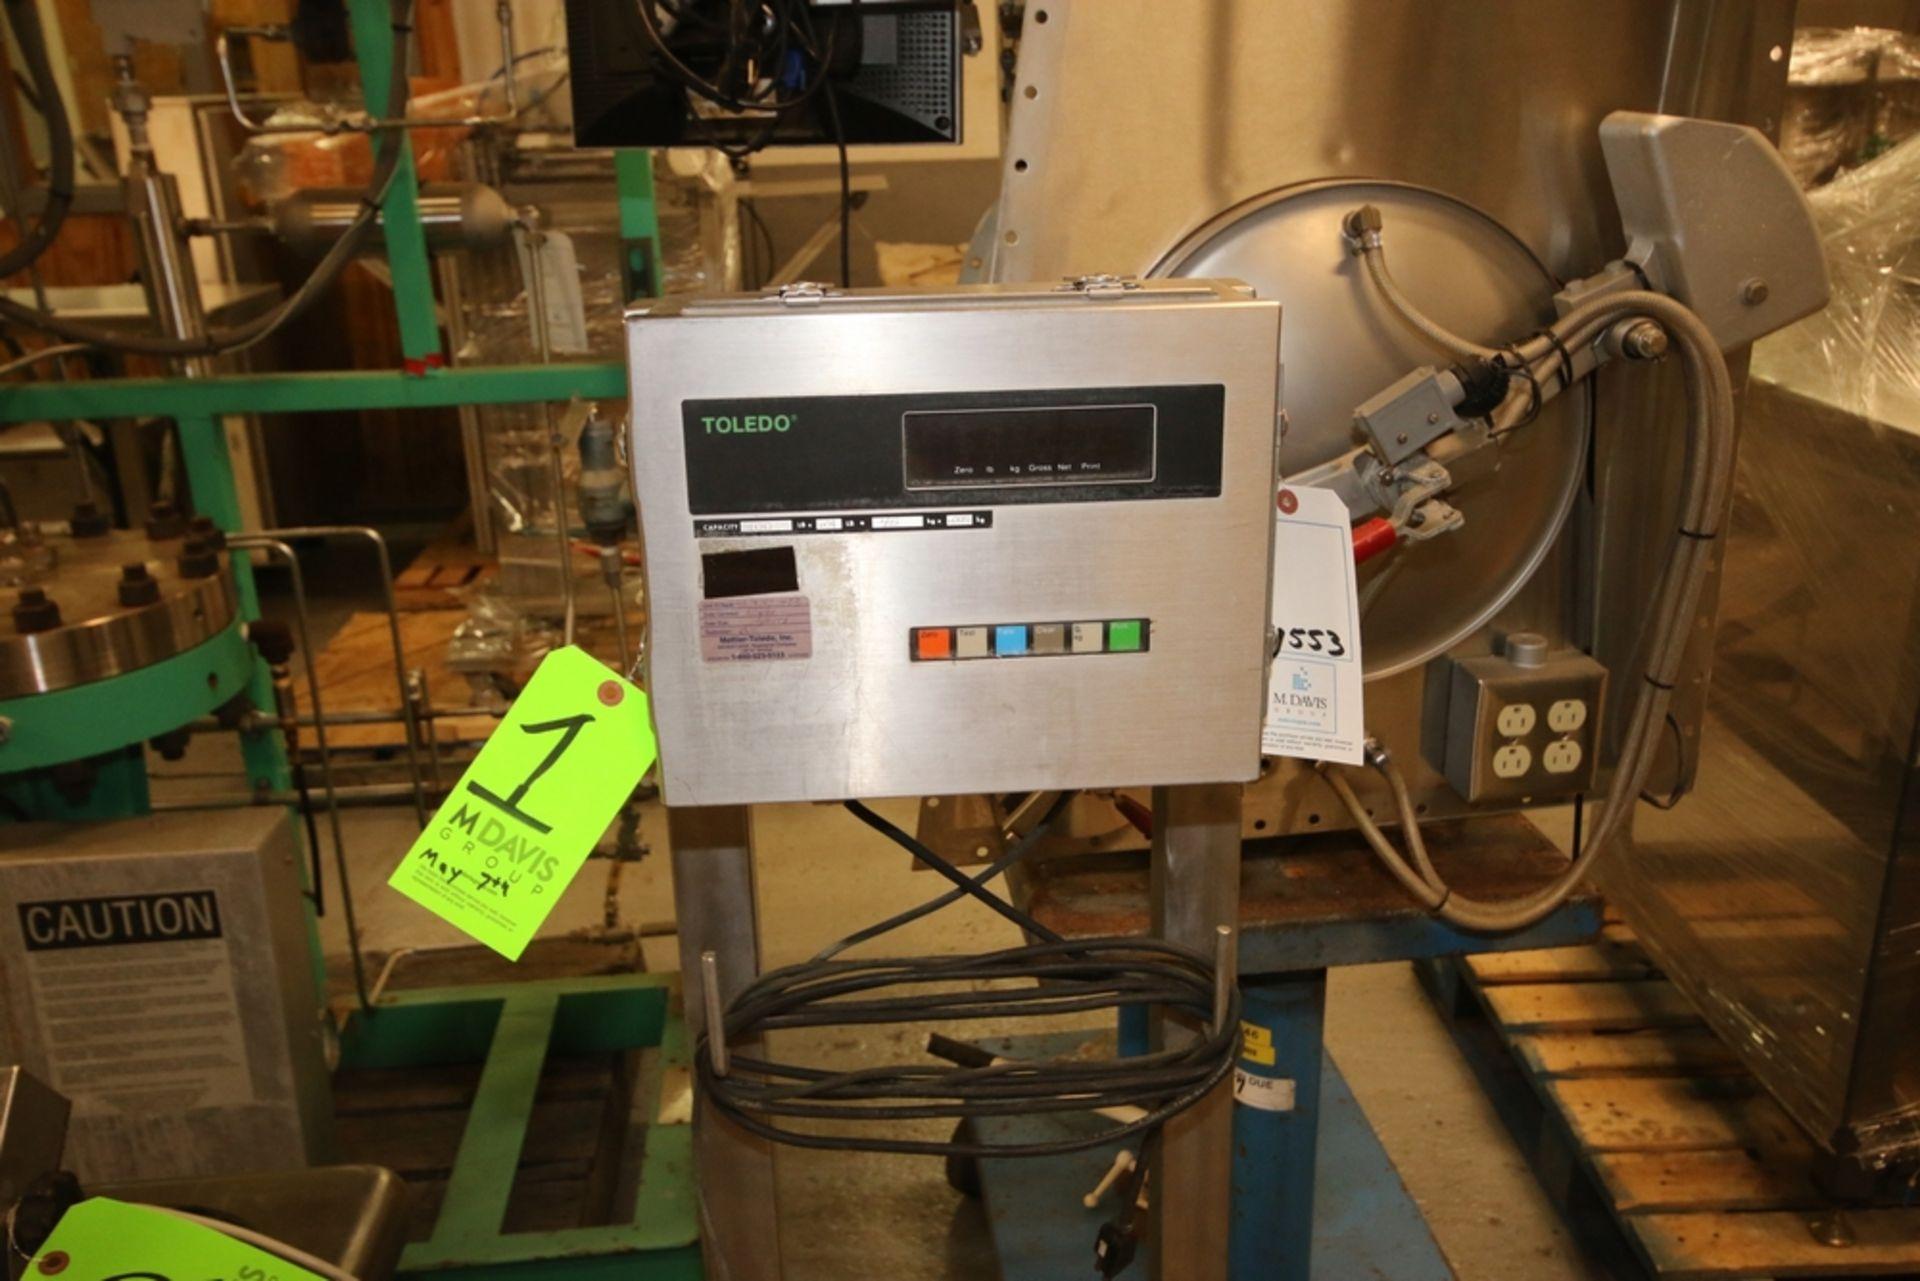 Lot 1 - Mettler Toledo S/S Digital Platform Scale, M/N 8140, S/N 4236703-4TR, 100 Capacity, with Aprox.